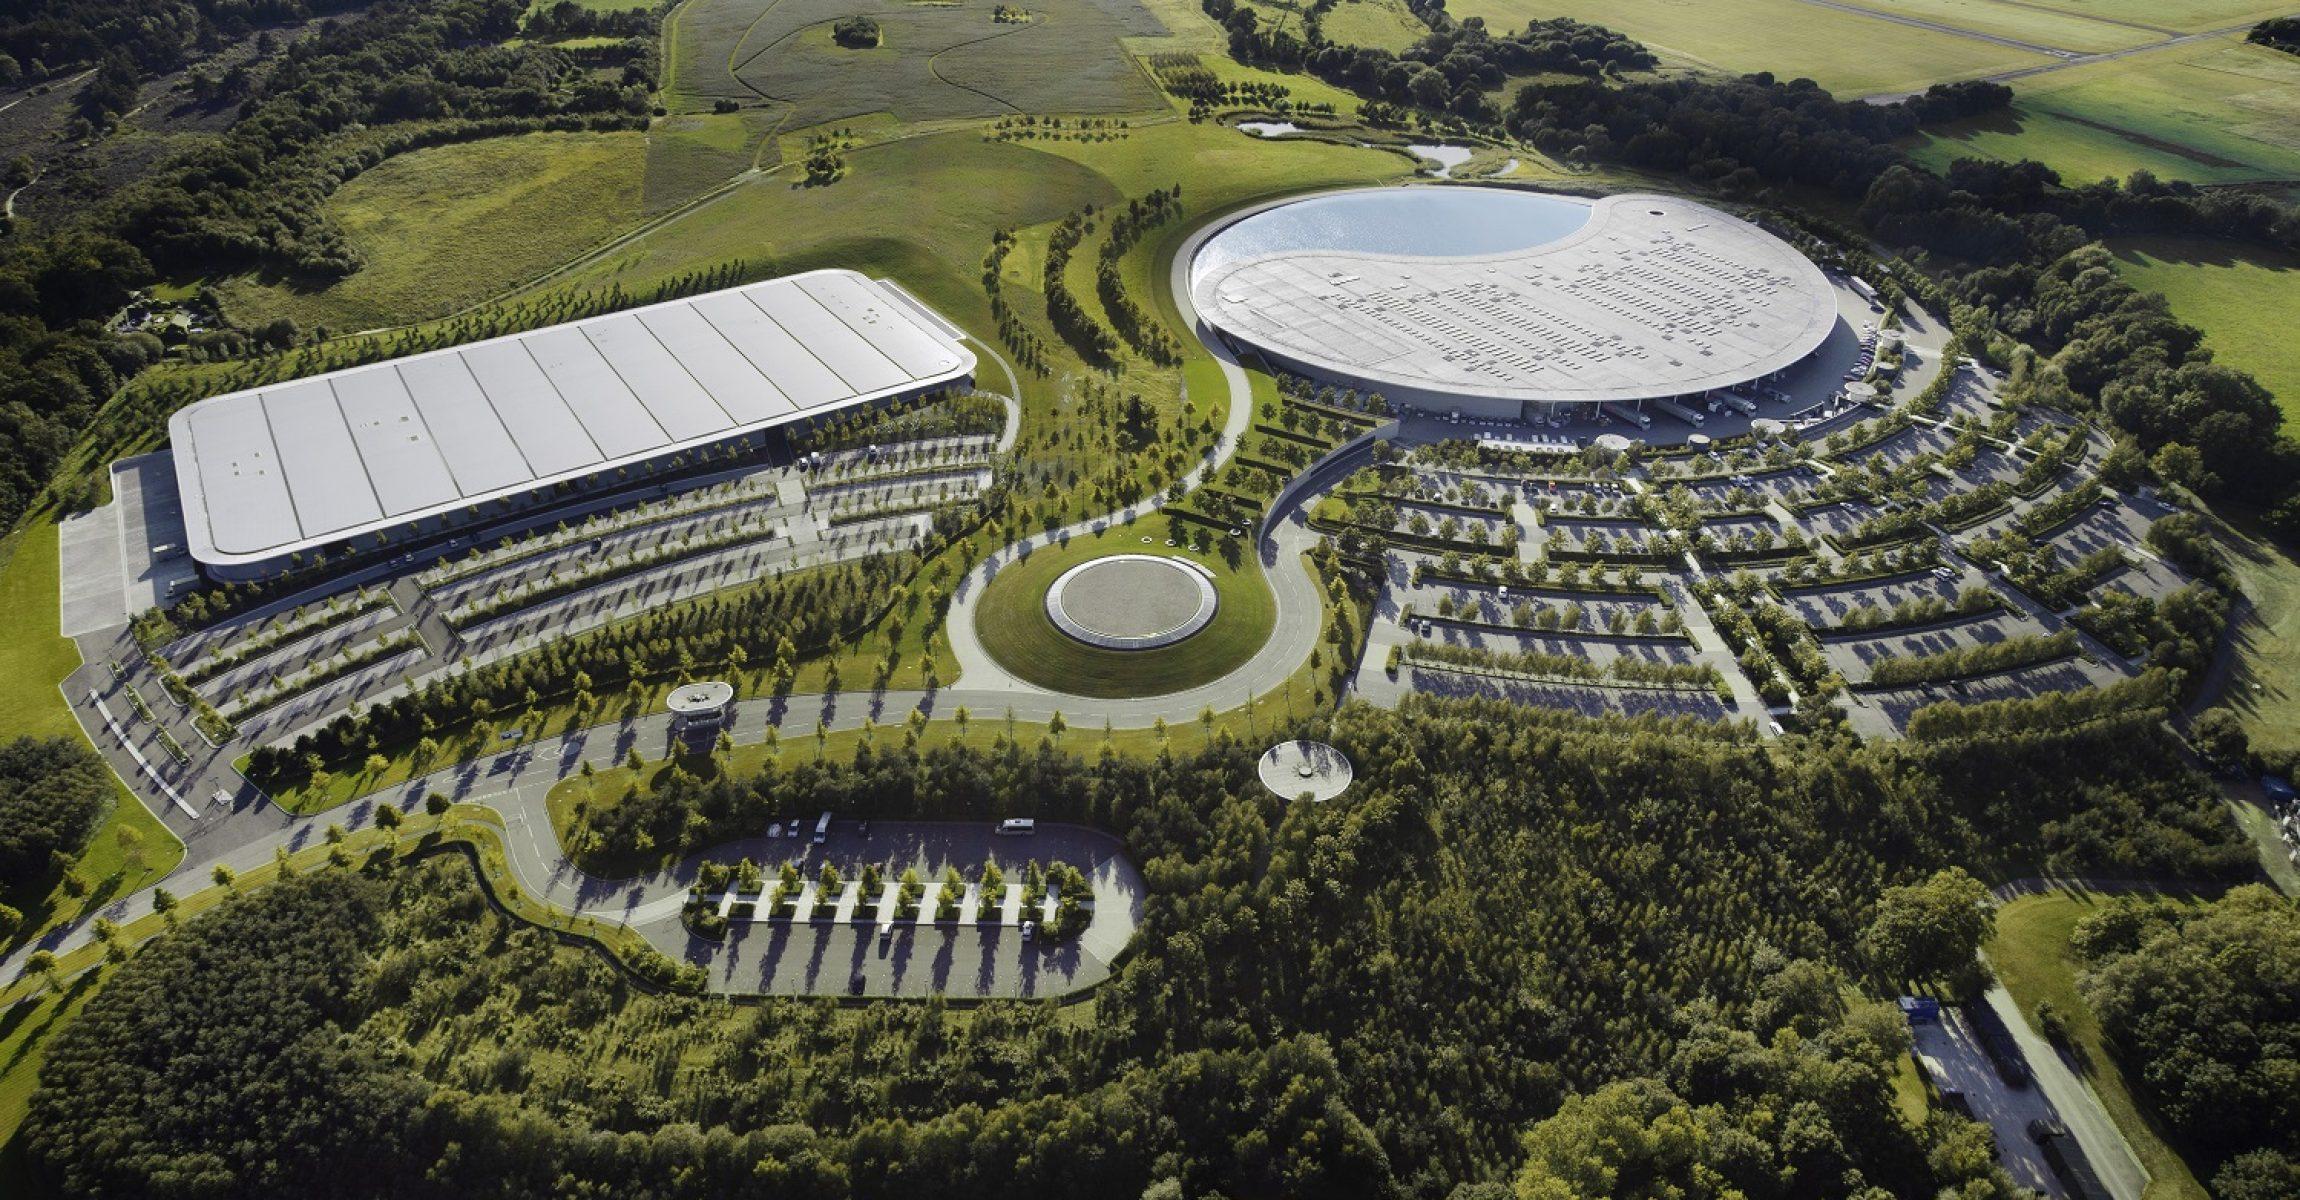 McLaren Technology Centre, Woking, Great Britain